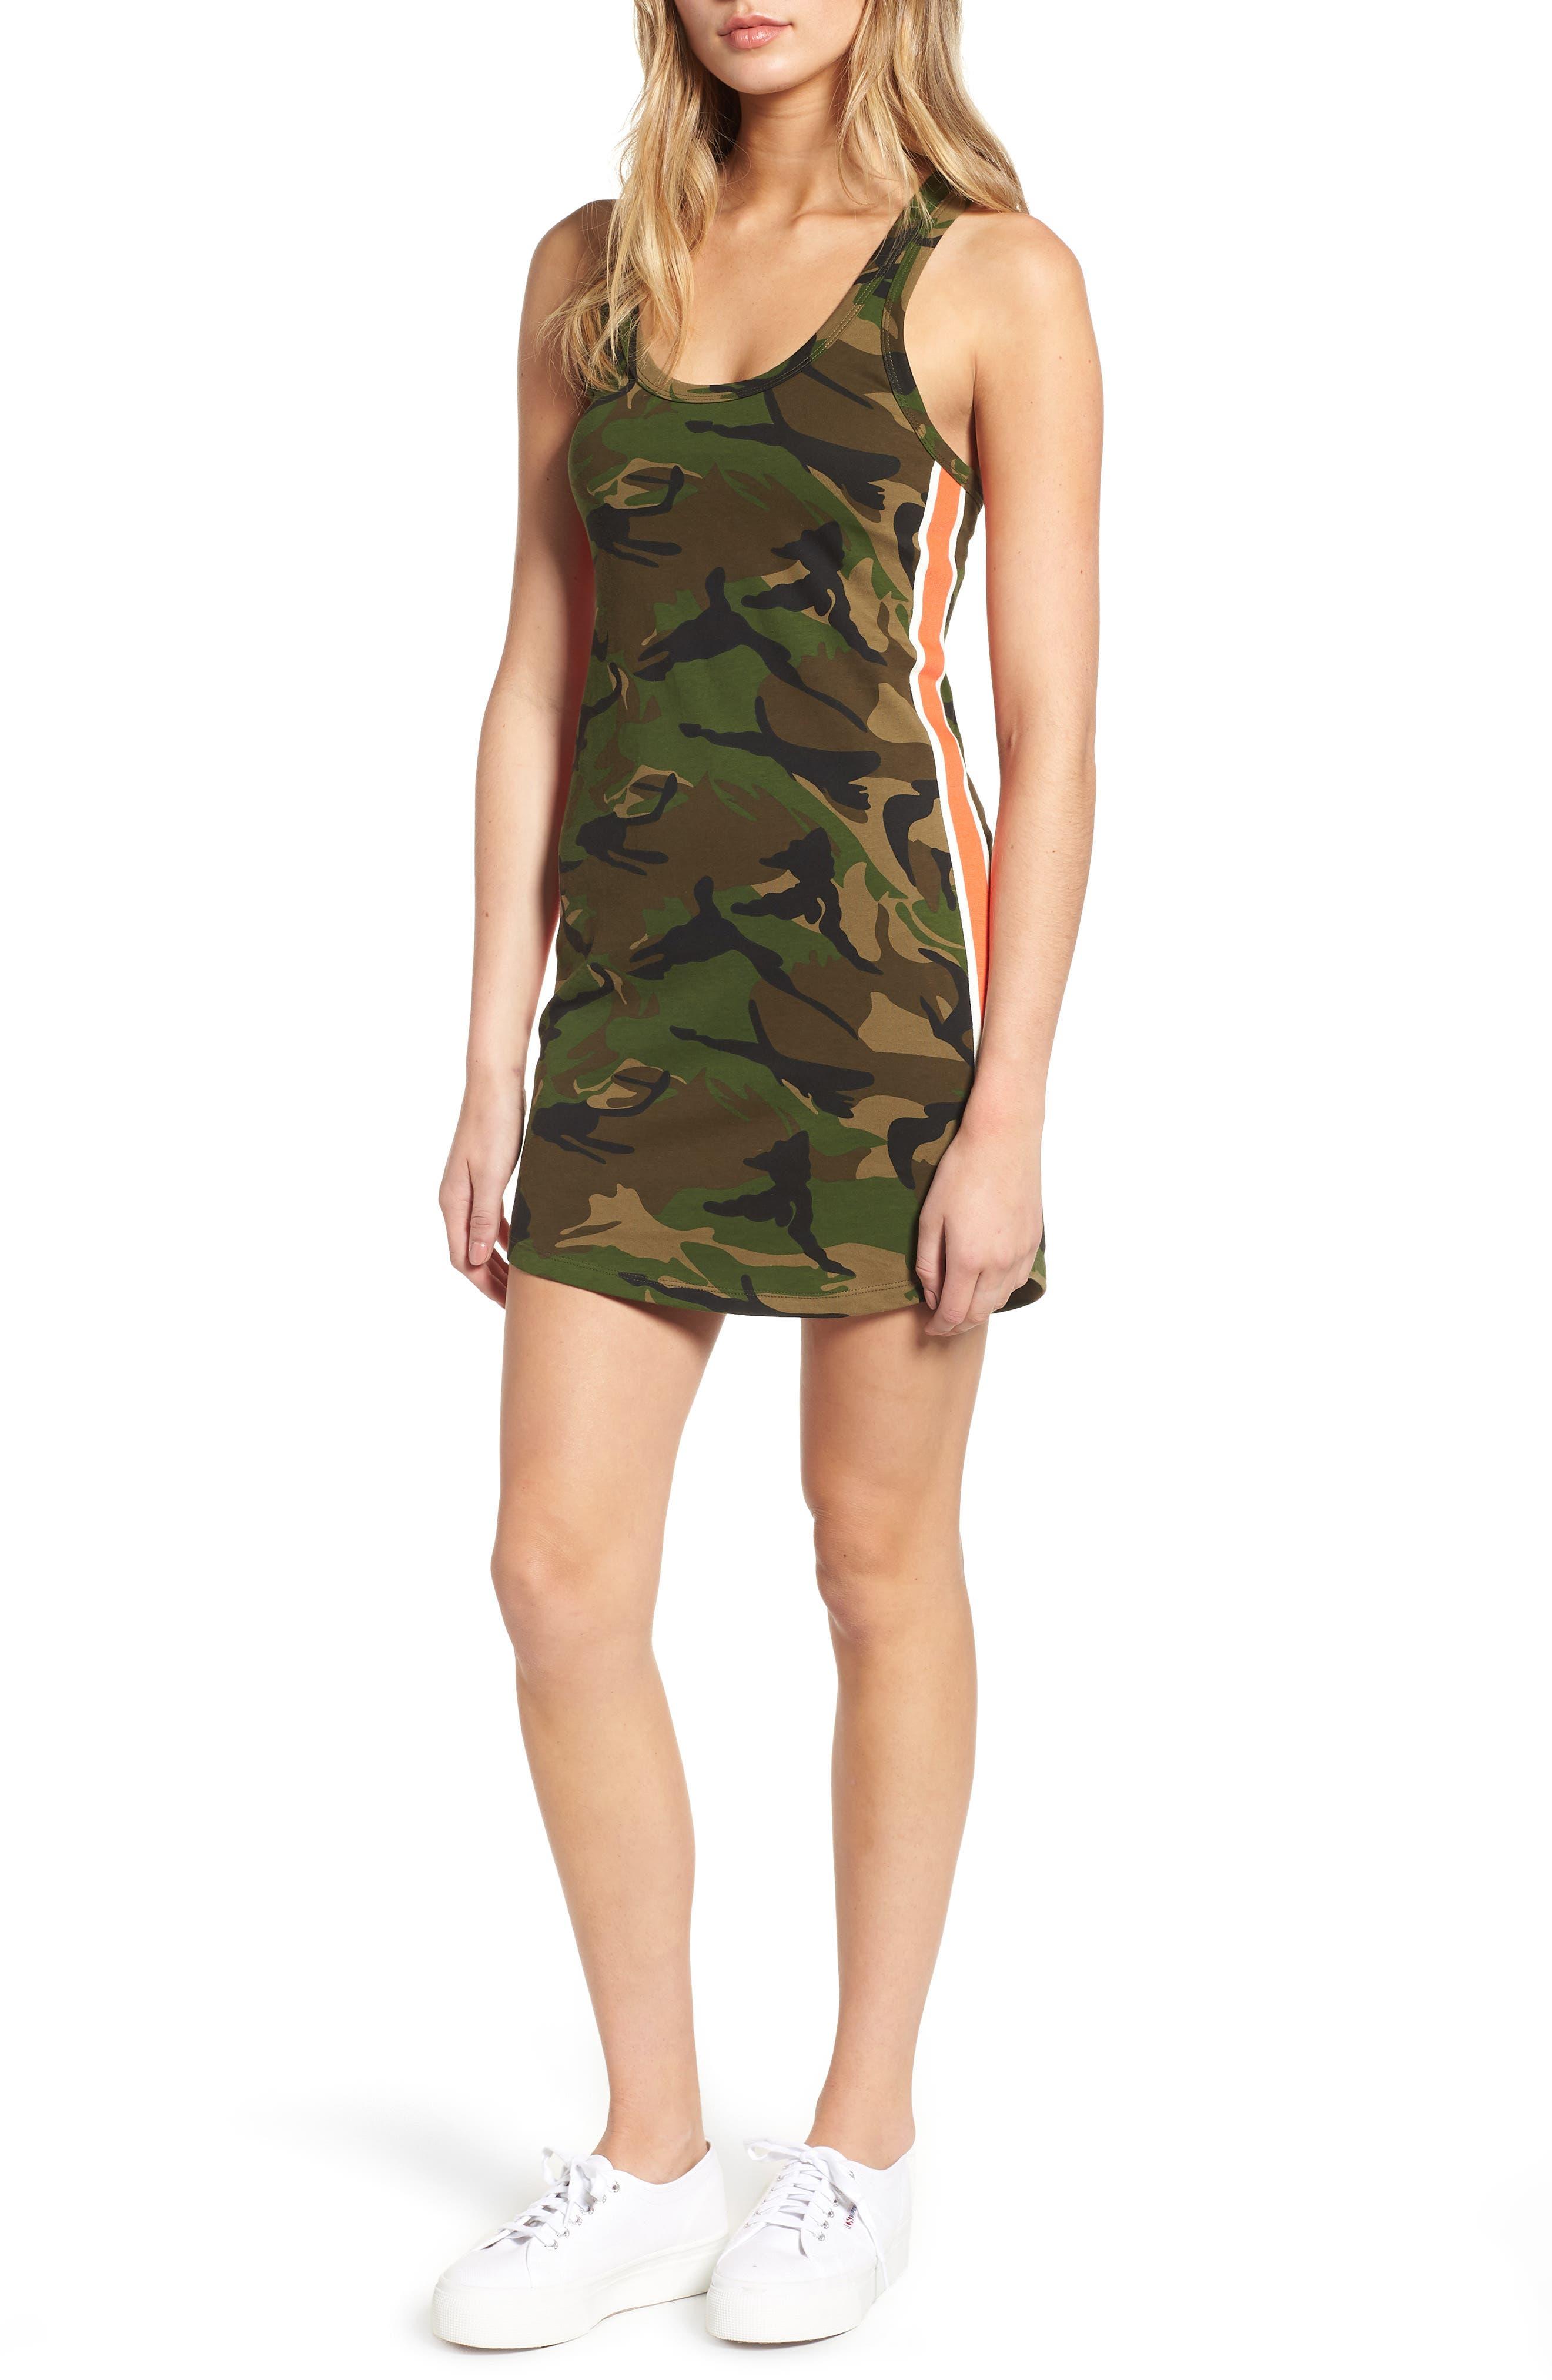 Camo Print Tank Dress,                         Main,                         color, ARMY CAMO